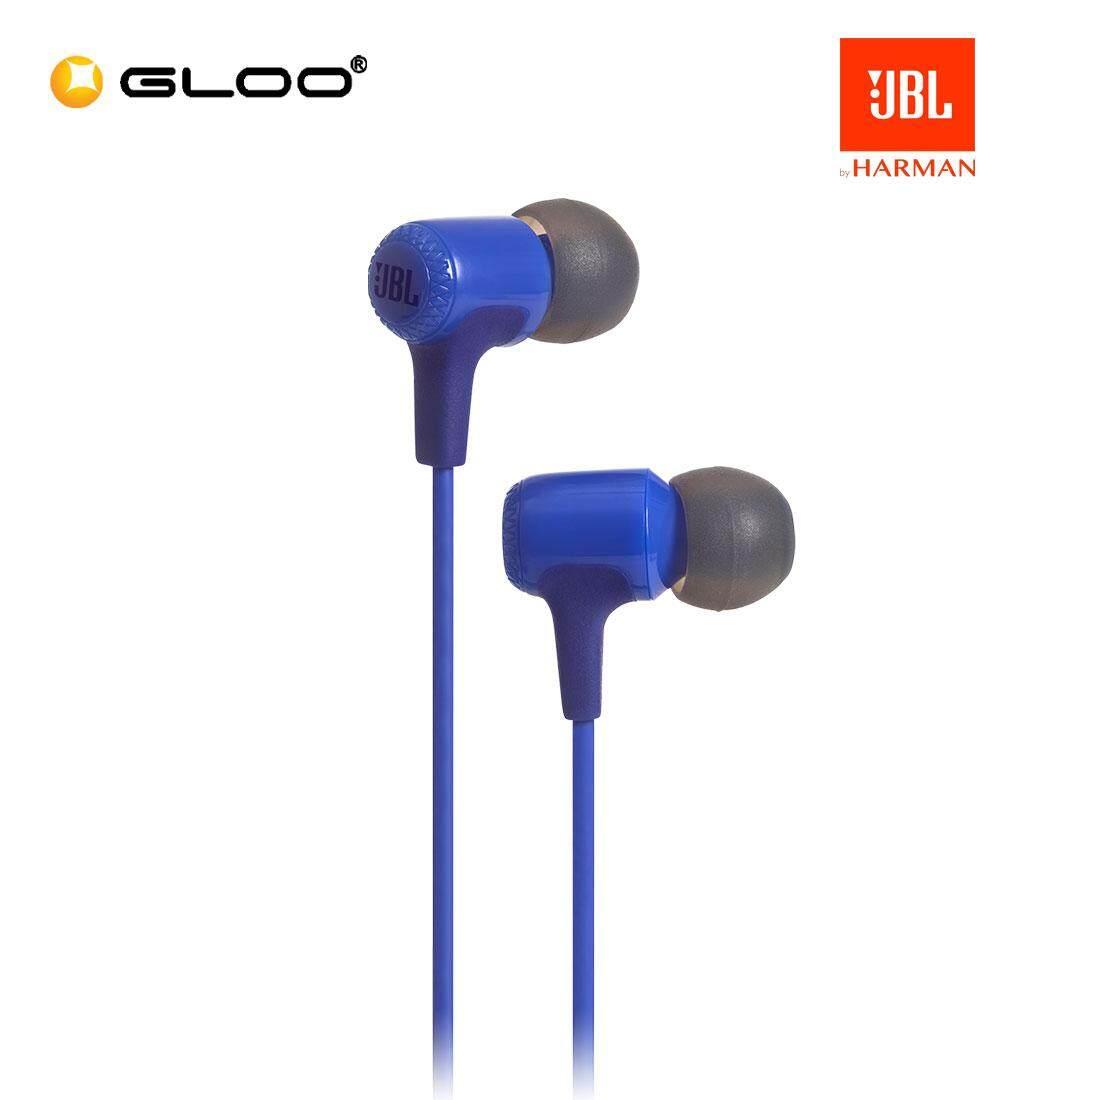 JBL E15 In-Ear Headphones (Black/Blue/Red/Teal)